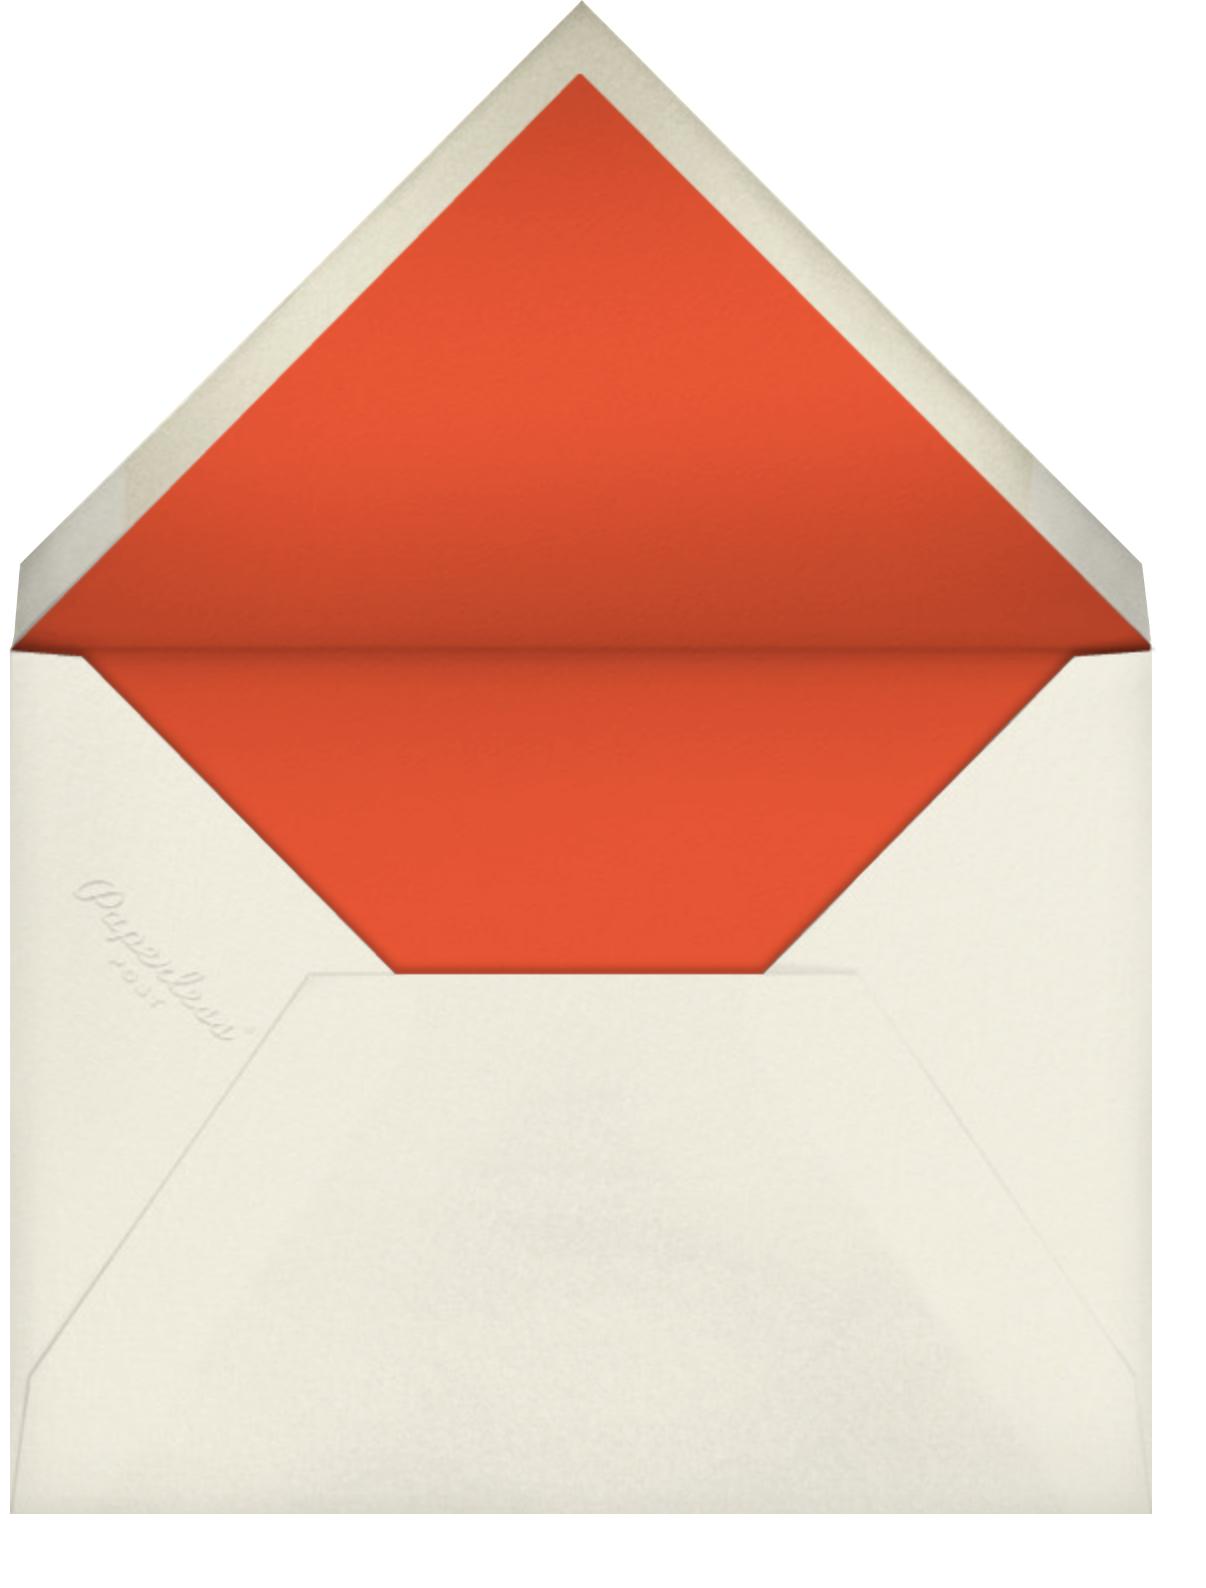 Petit Jardin - Sherbet - Anthropologie - Baby shower - envelope back